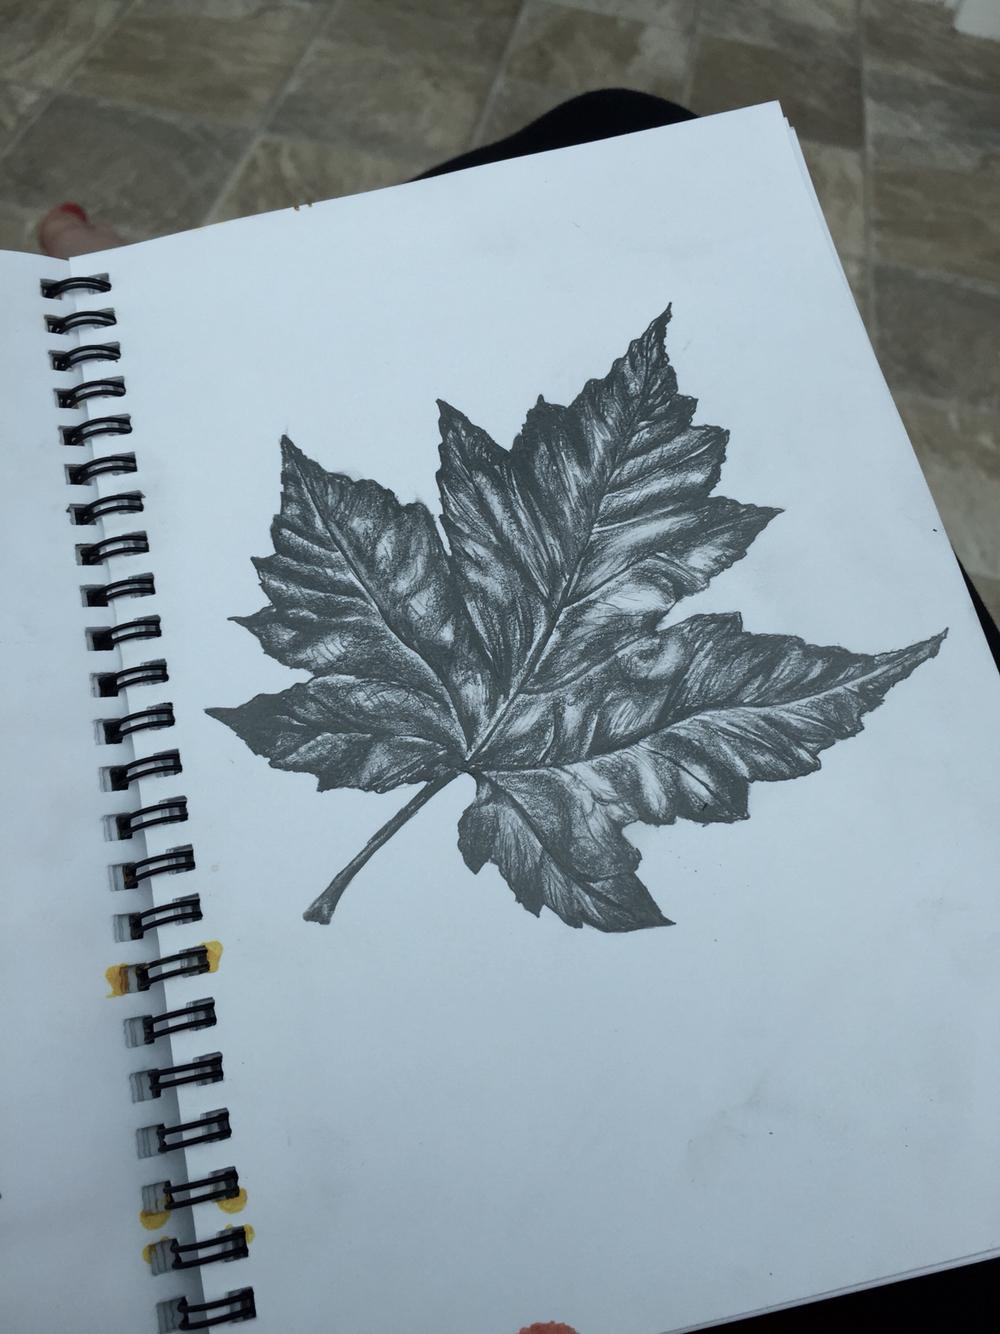 Drawn leaves tonal A Tonal Gcse leaf drawing